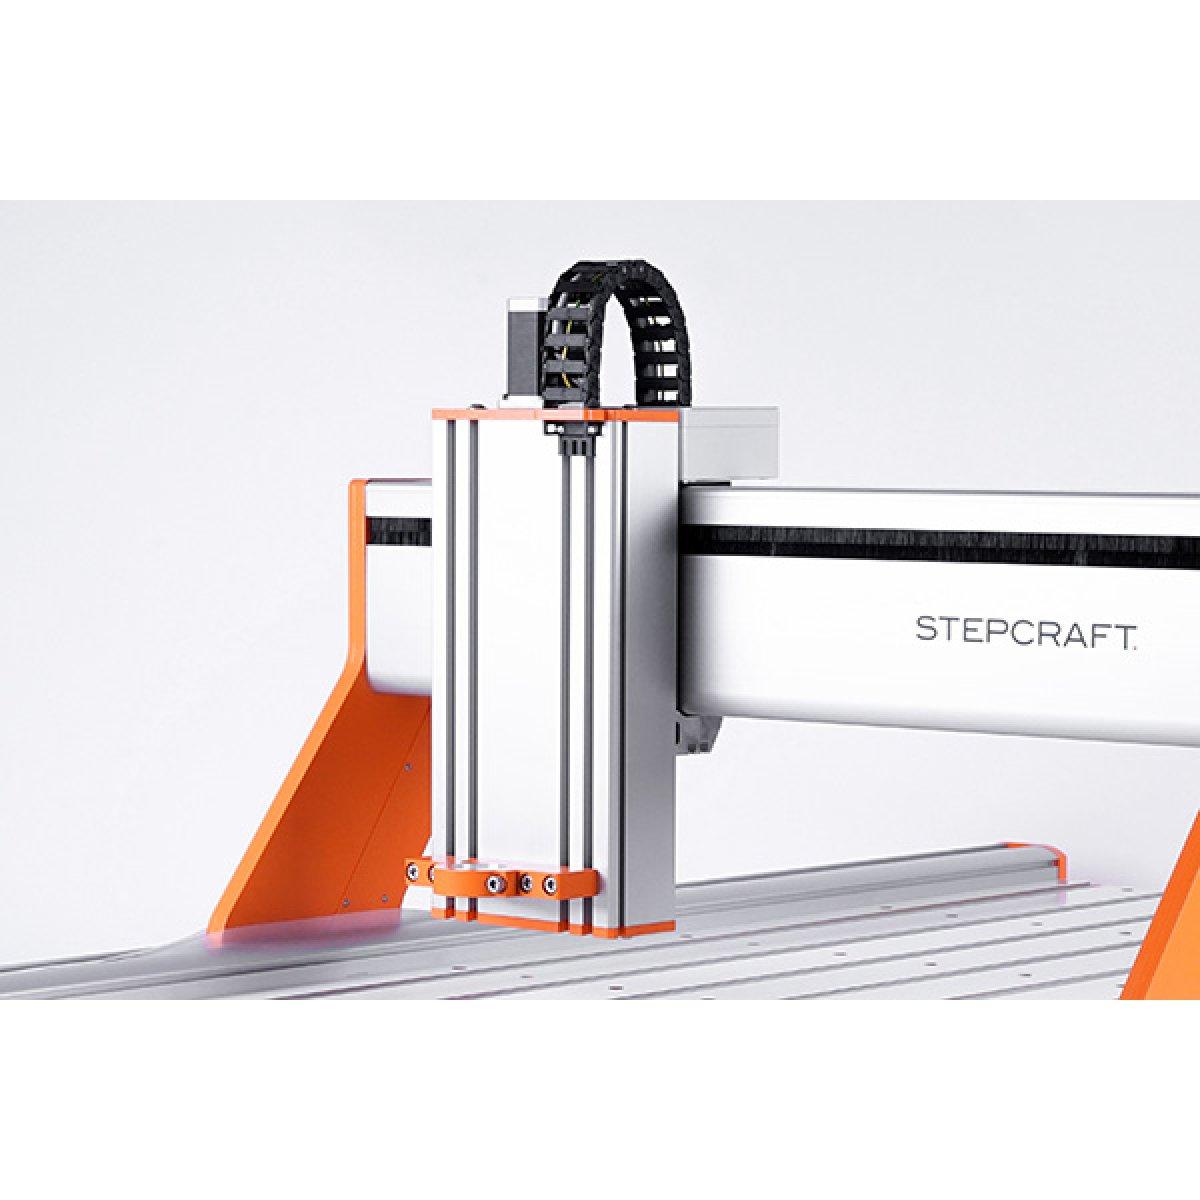 stepcraft-q204-cnc-system_1_16